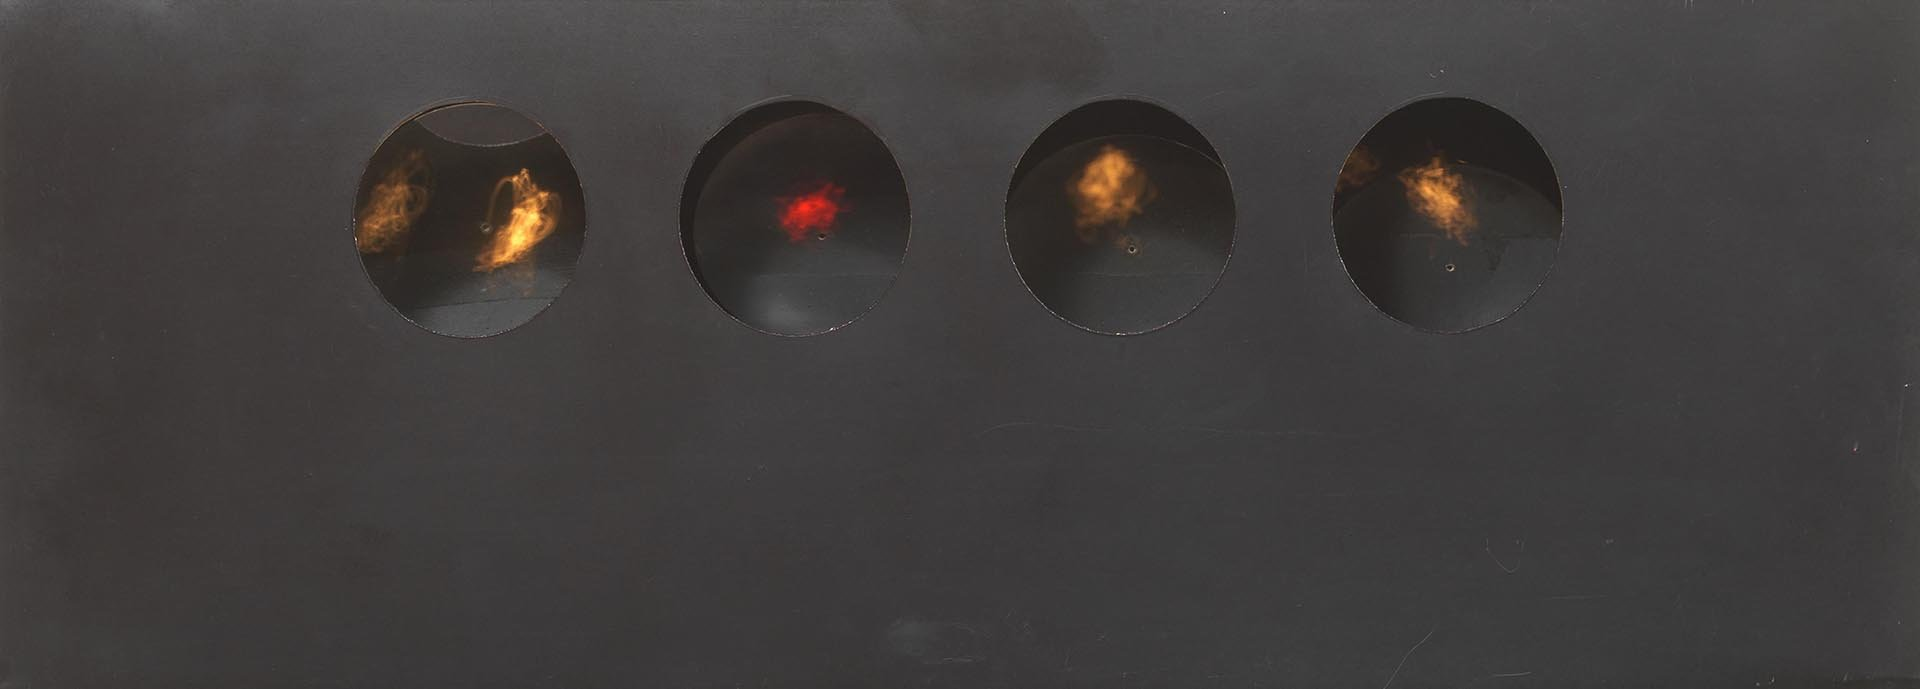 Colombo, Sismostrutture, 1962, 185x50x145 cm